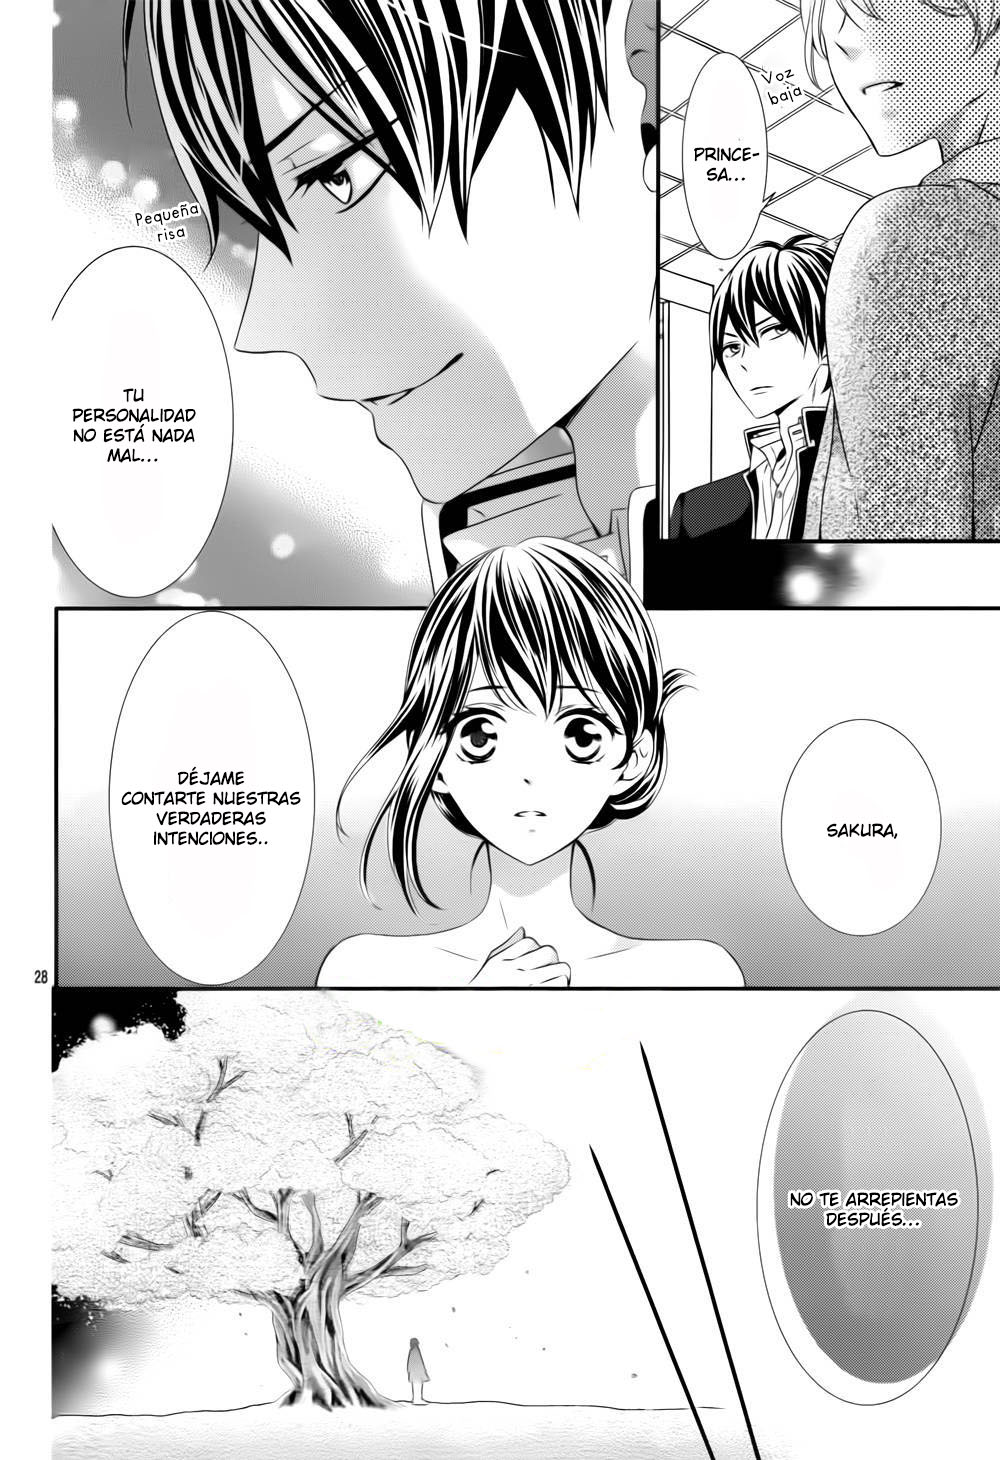 http://c5.ninemanga.com/es_manga/27/14875/363596/7aa28d36b10308d292fb50b932cda8e9.jpg Page 31